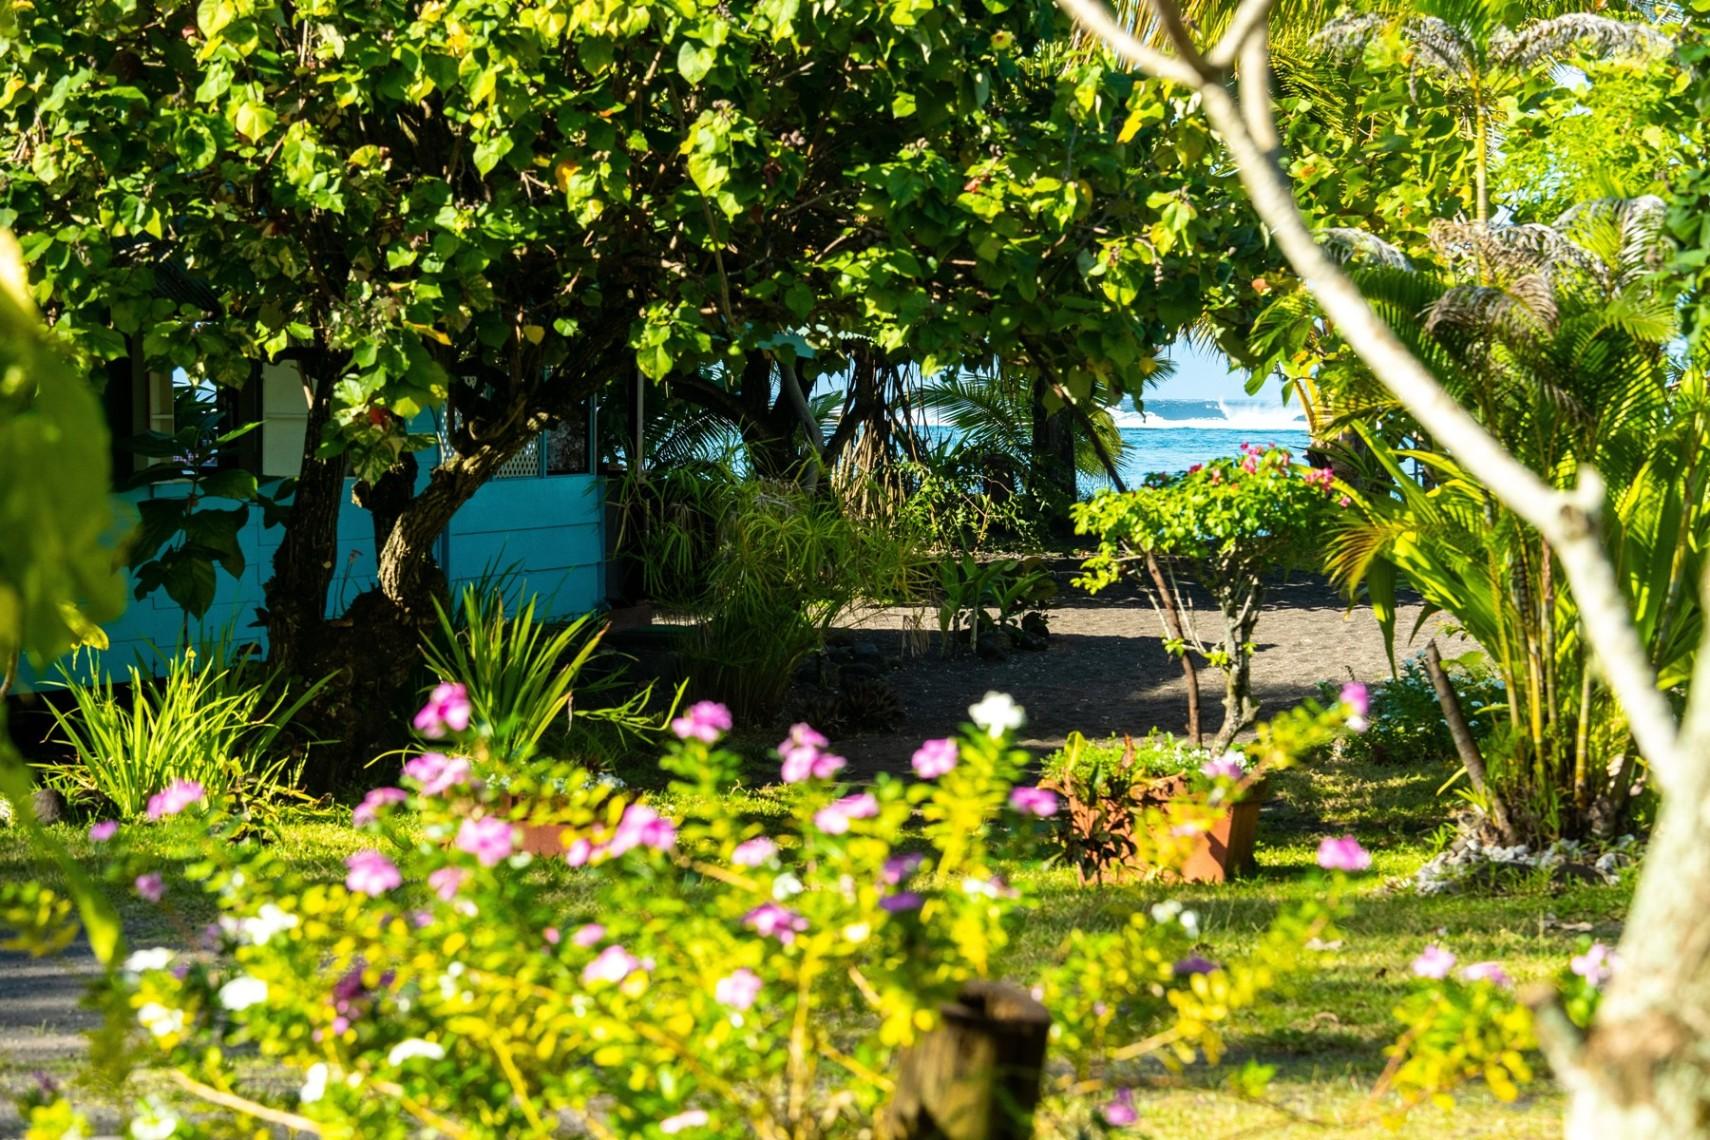 https://tahititourisme.com/wp-content/uploads/2019/08/copie-tahiti-tourisme-800ko-1.jpg